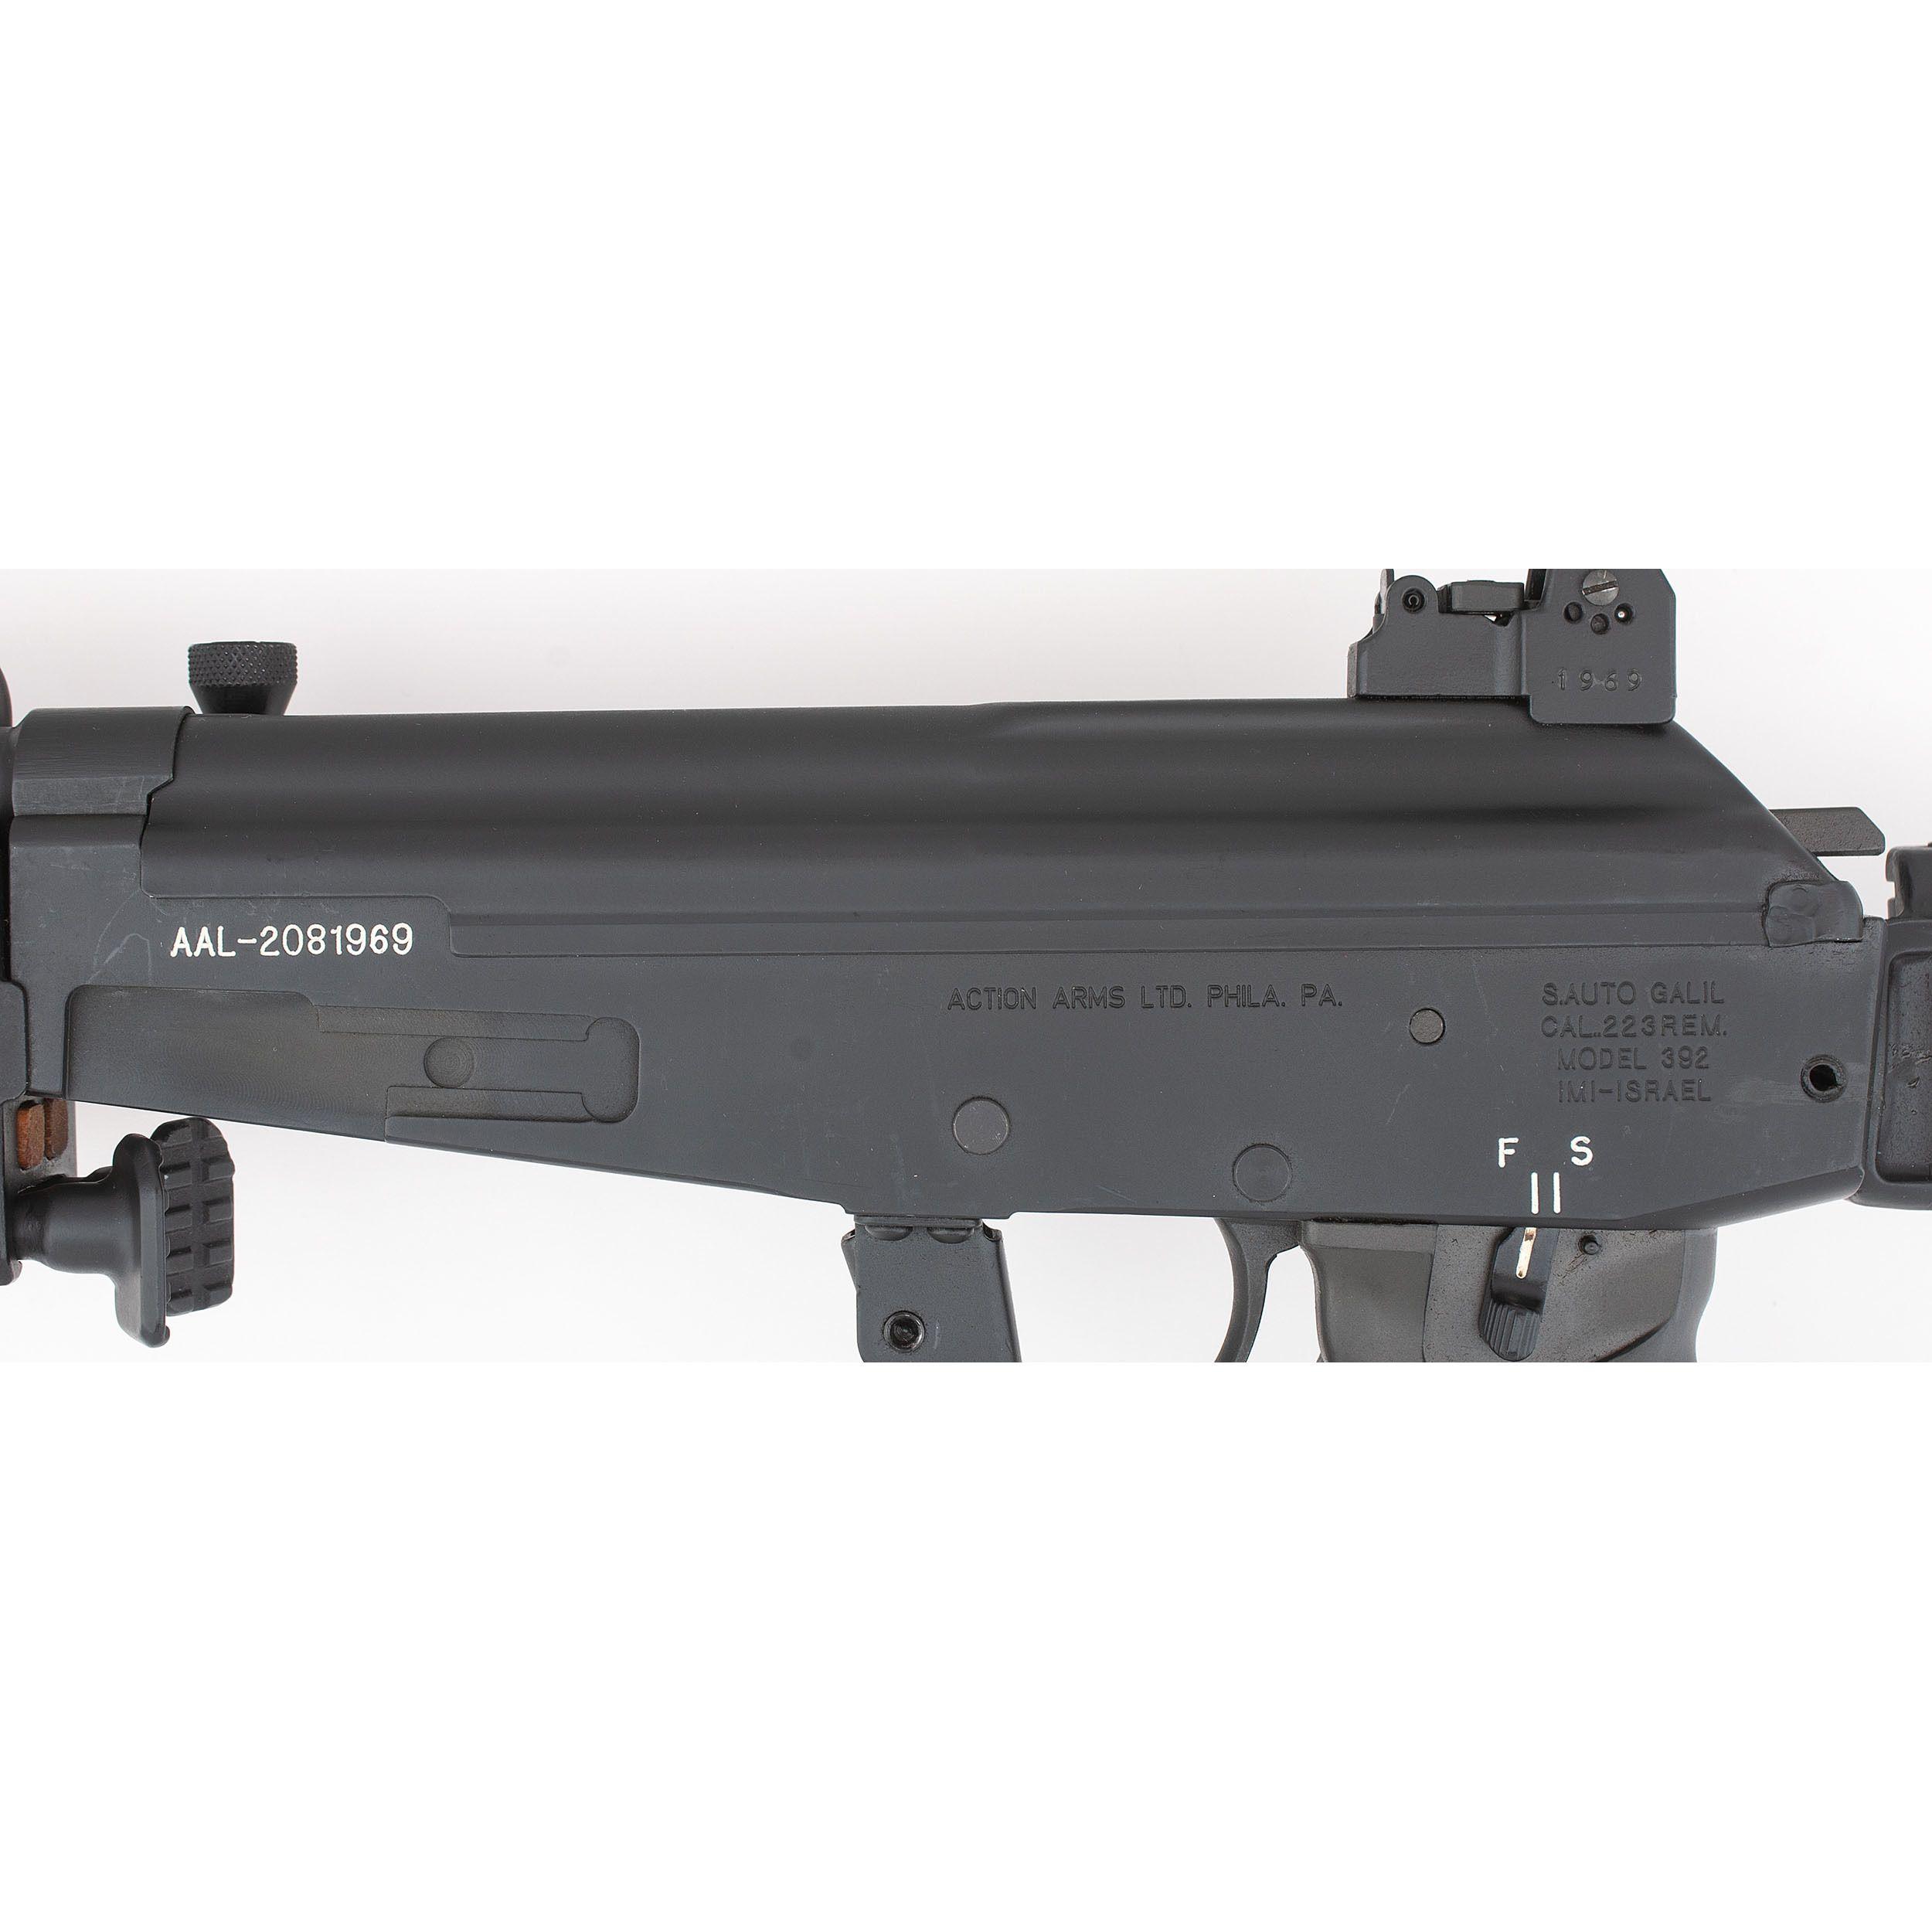 IMI Galil Model 392 Semi-Automatic     | Firearms | Semi